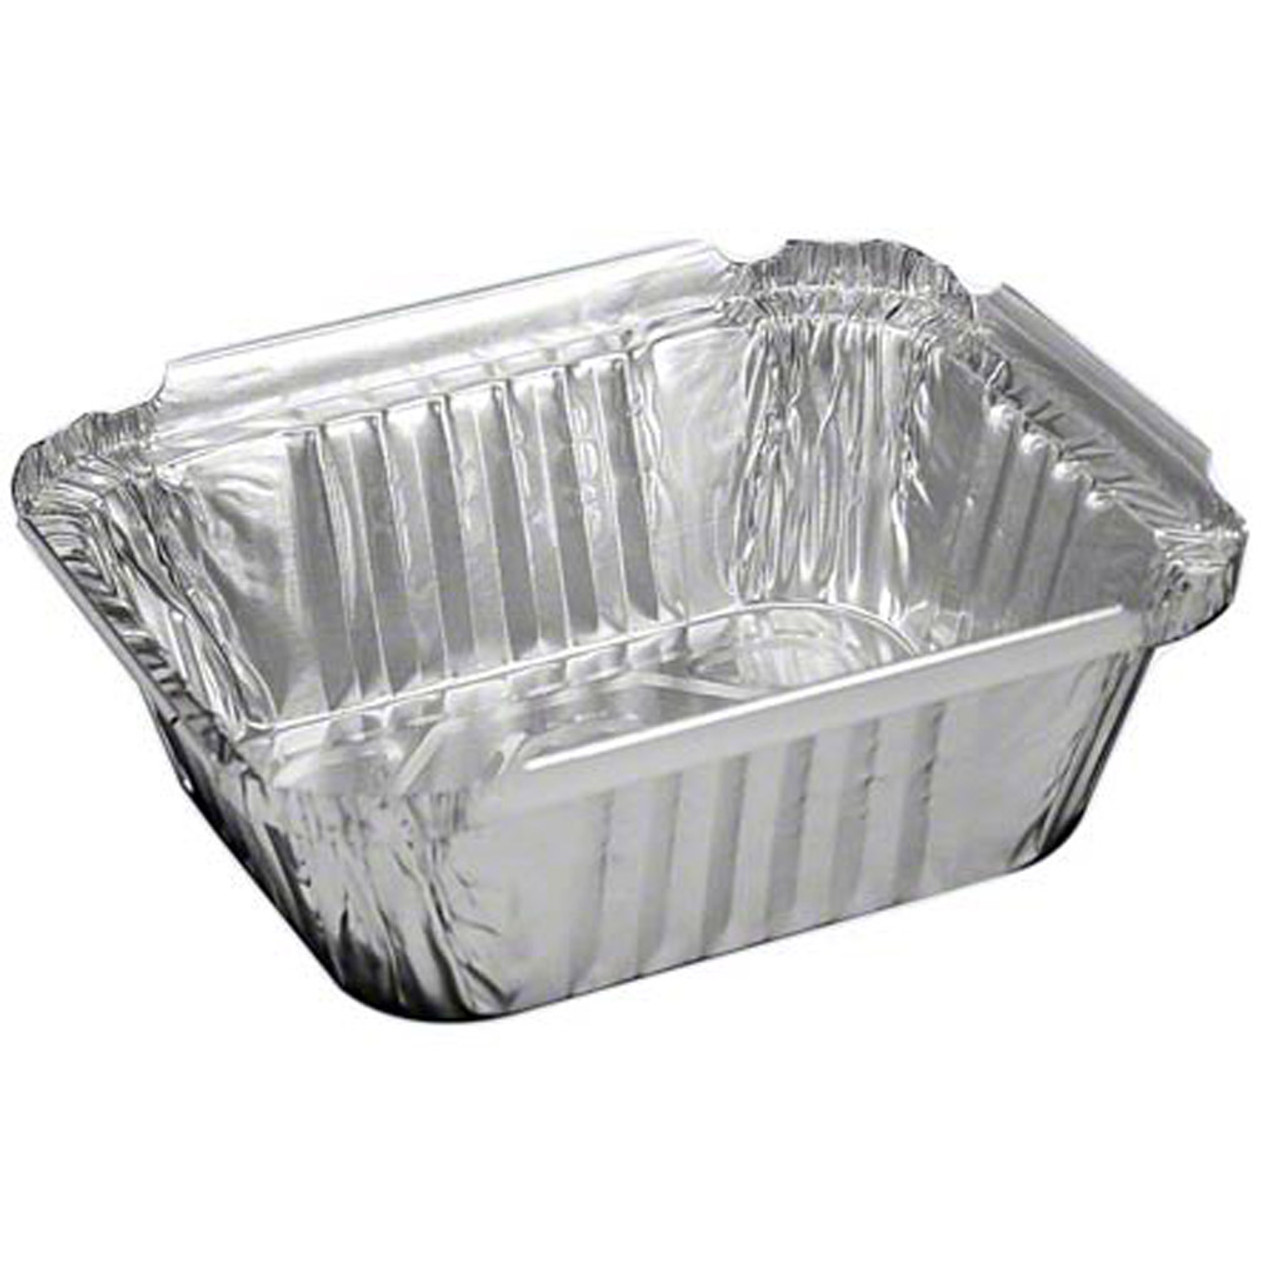 1lb aluminum foil pan with paper lid